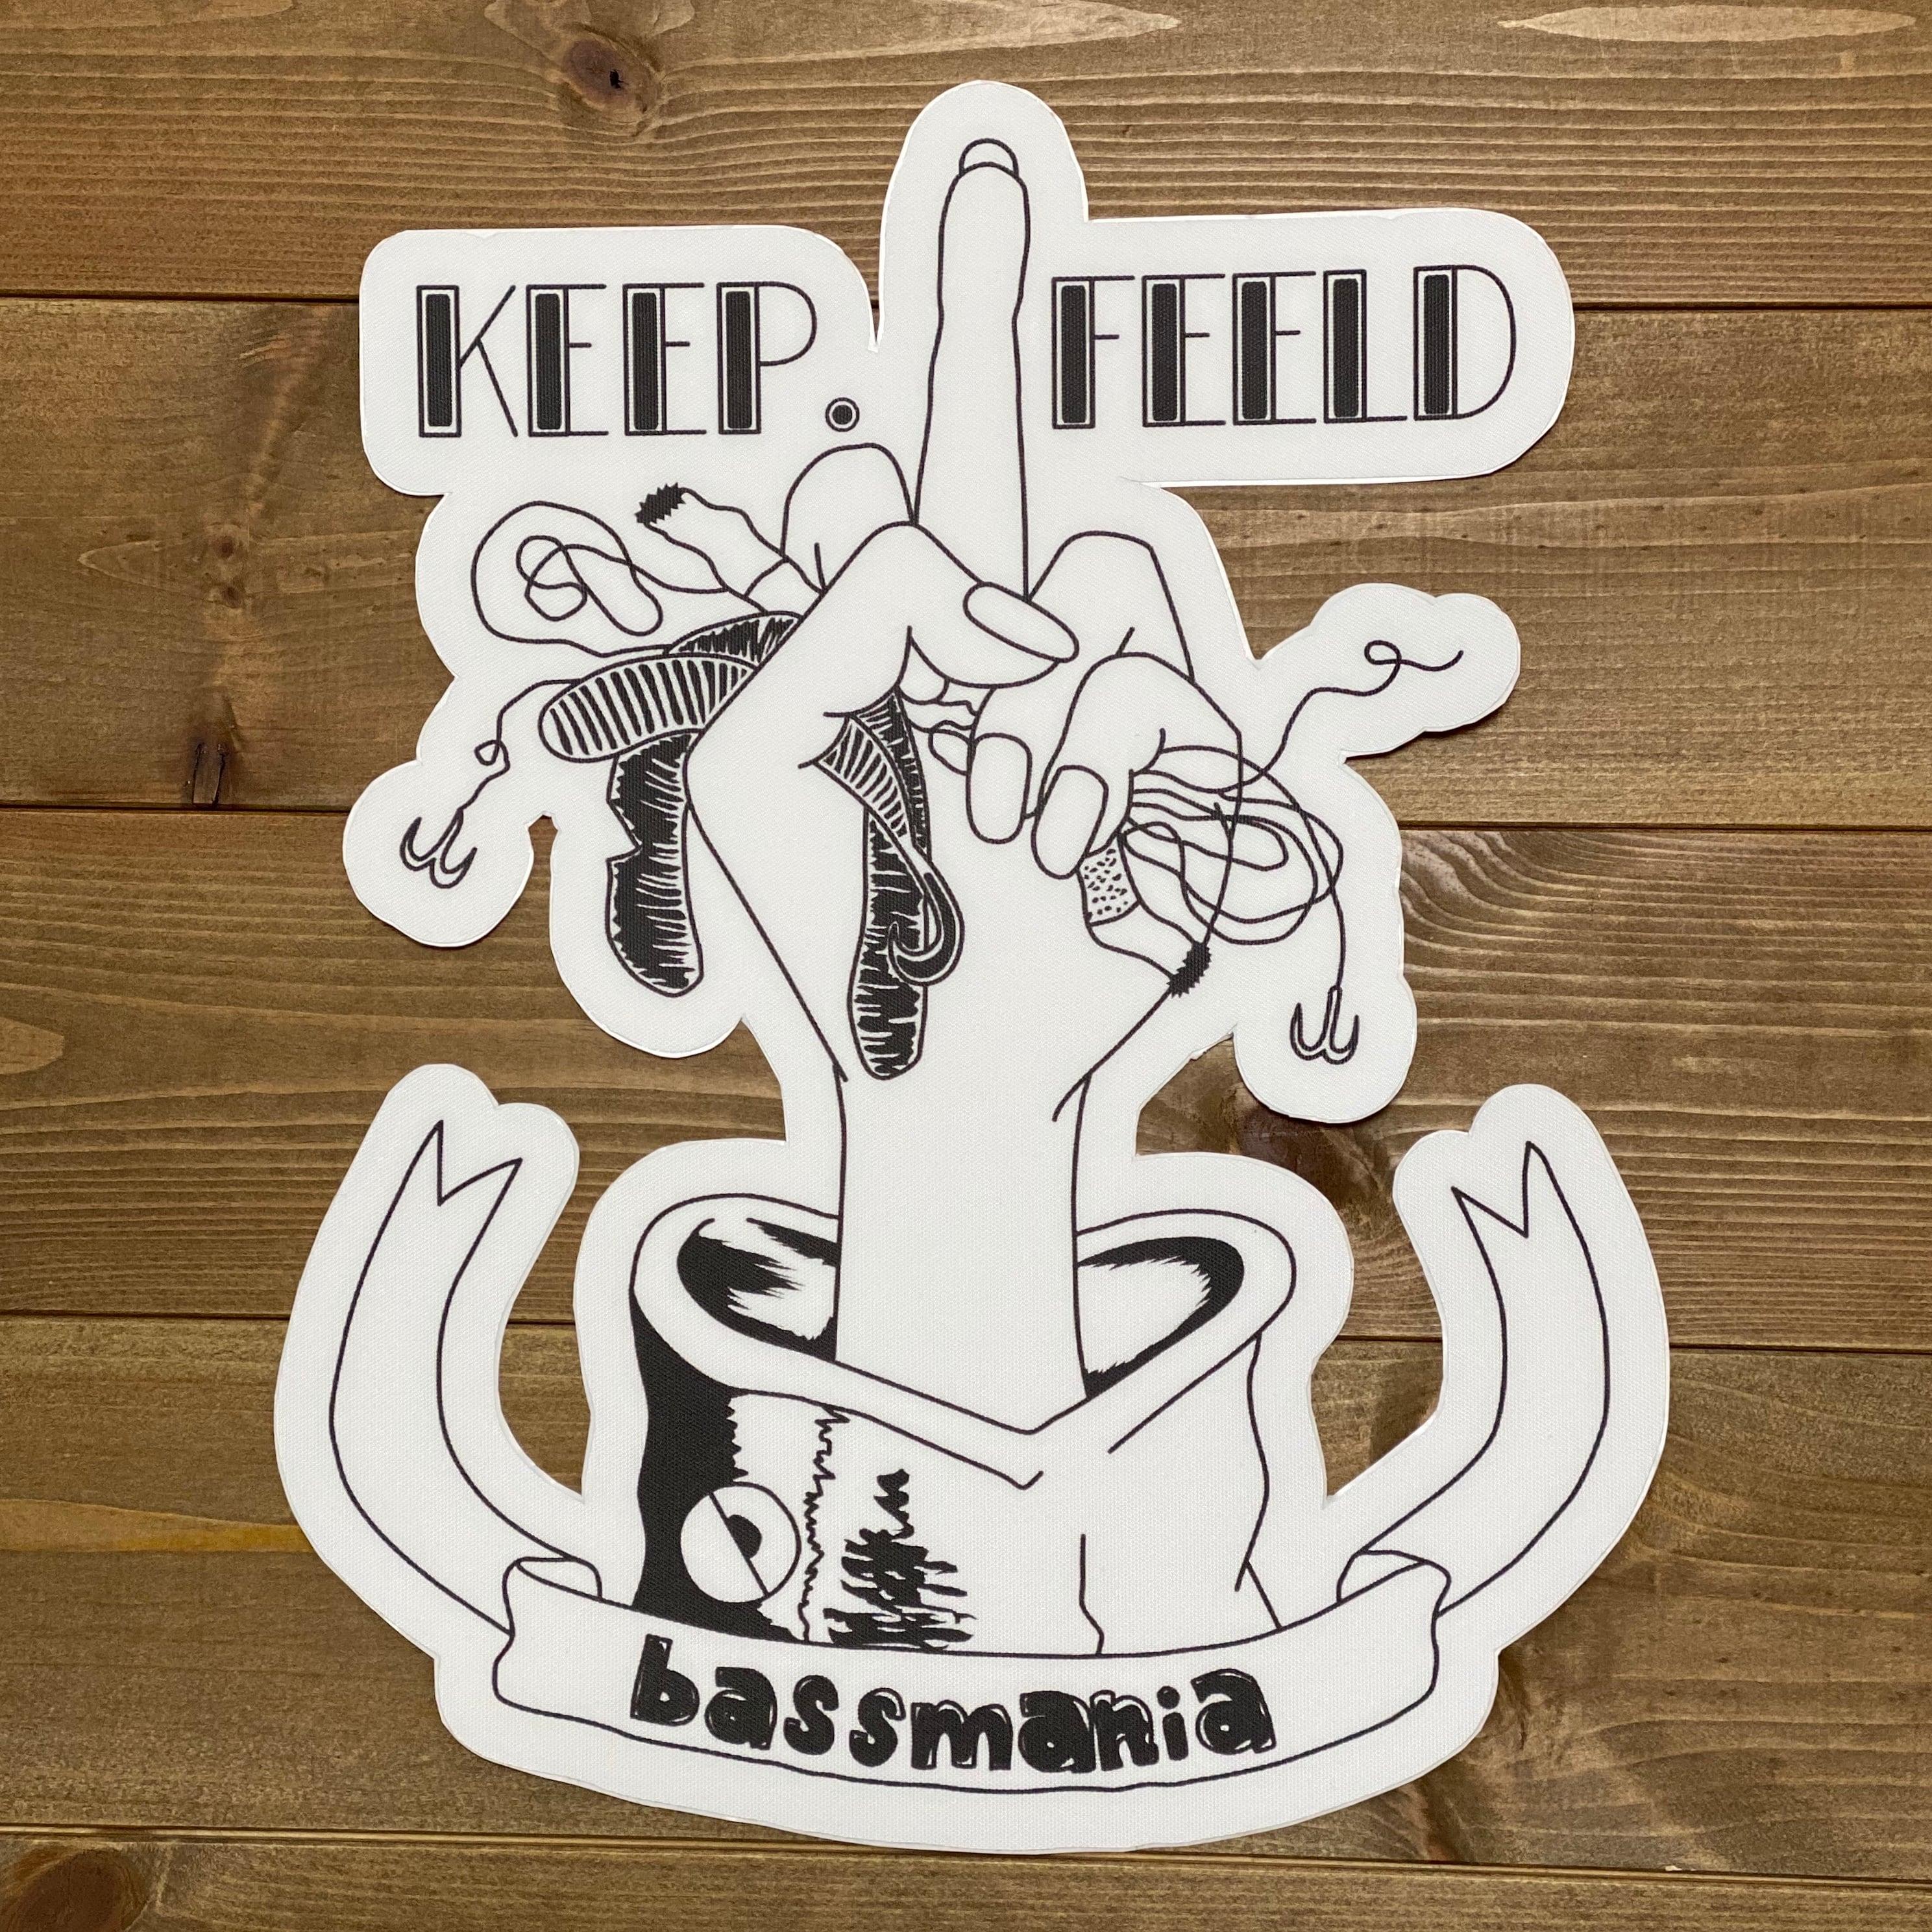 KEEP.FEELDボートカーペットデカール [small]